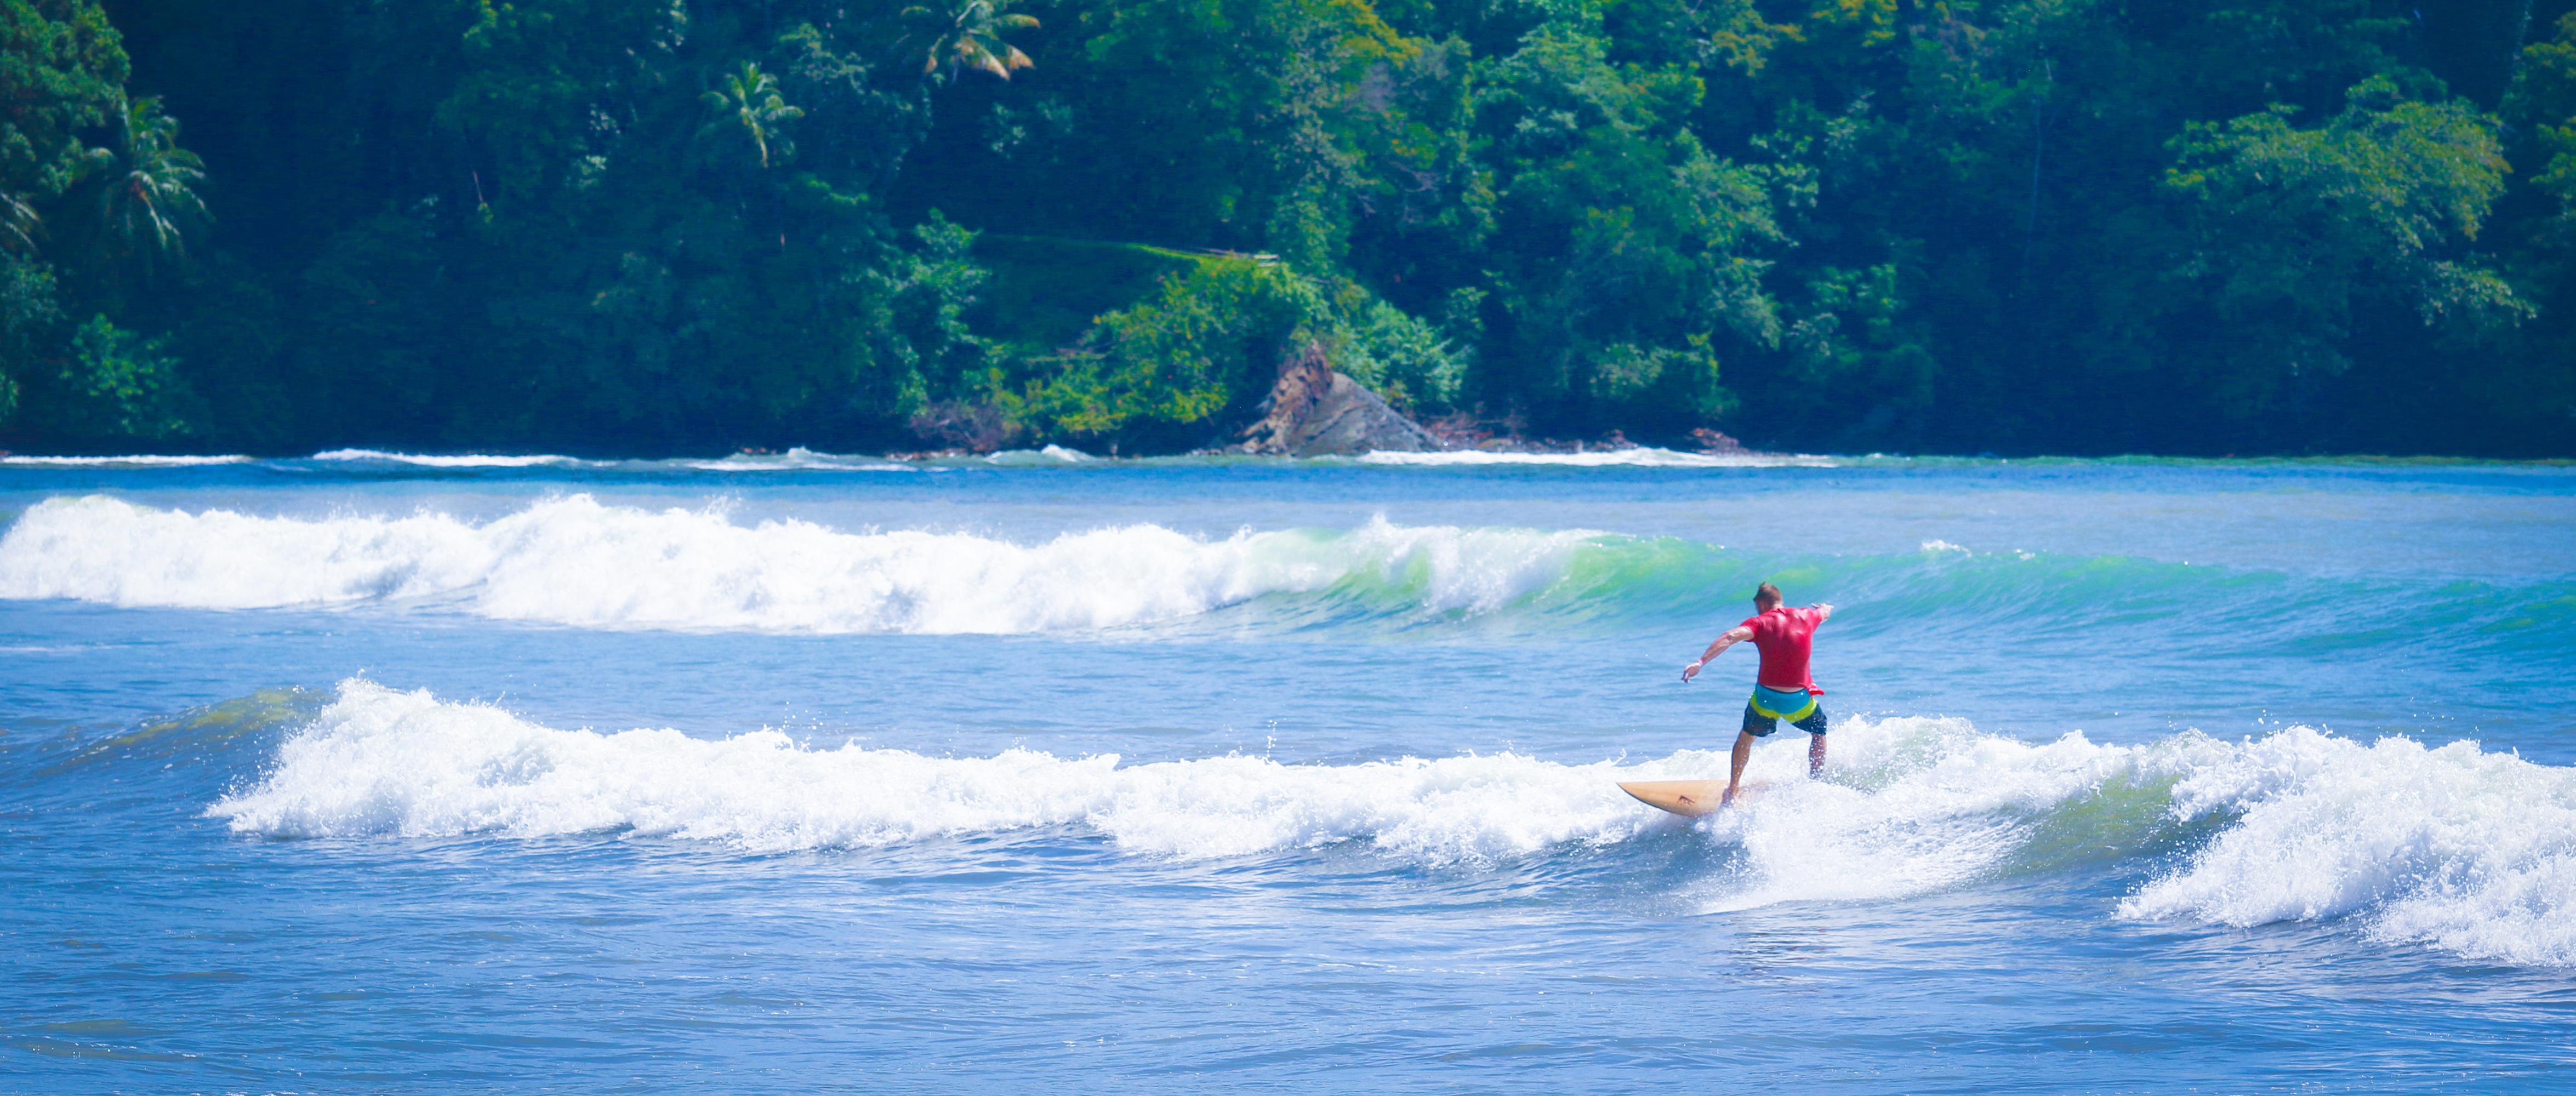 Costa Rica Surfer